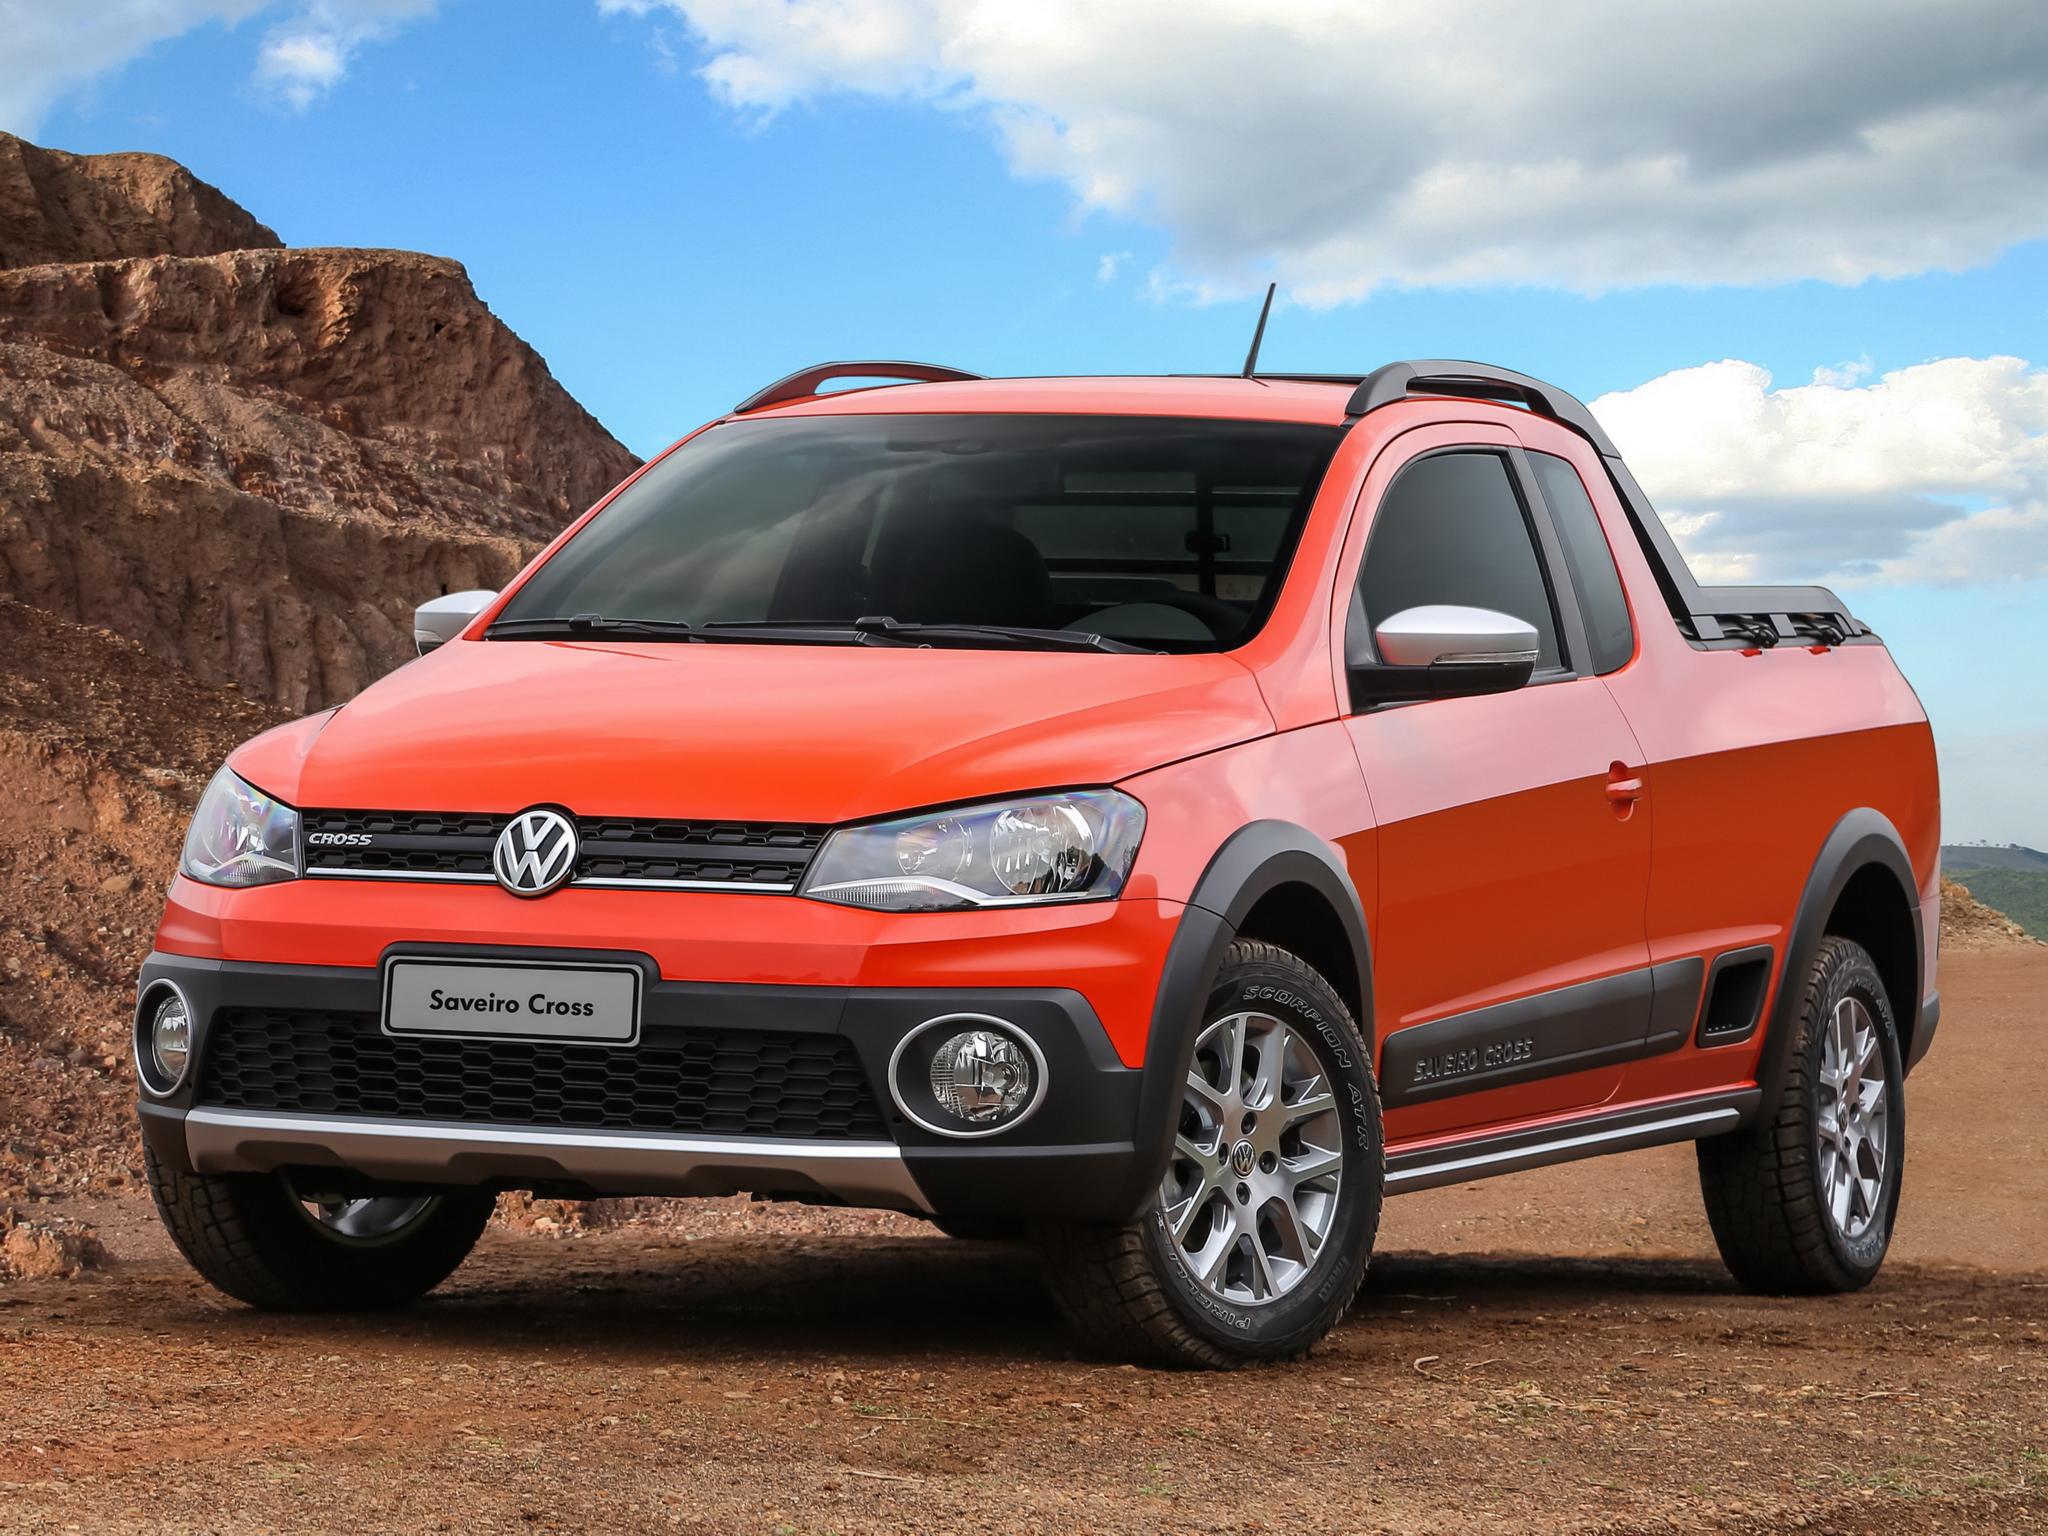 Funky Wall Lights >> 2014 Volkswagen Saveiro Cross Is a Funky Brazilian Pickup ...